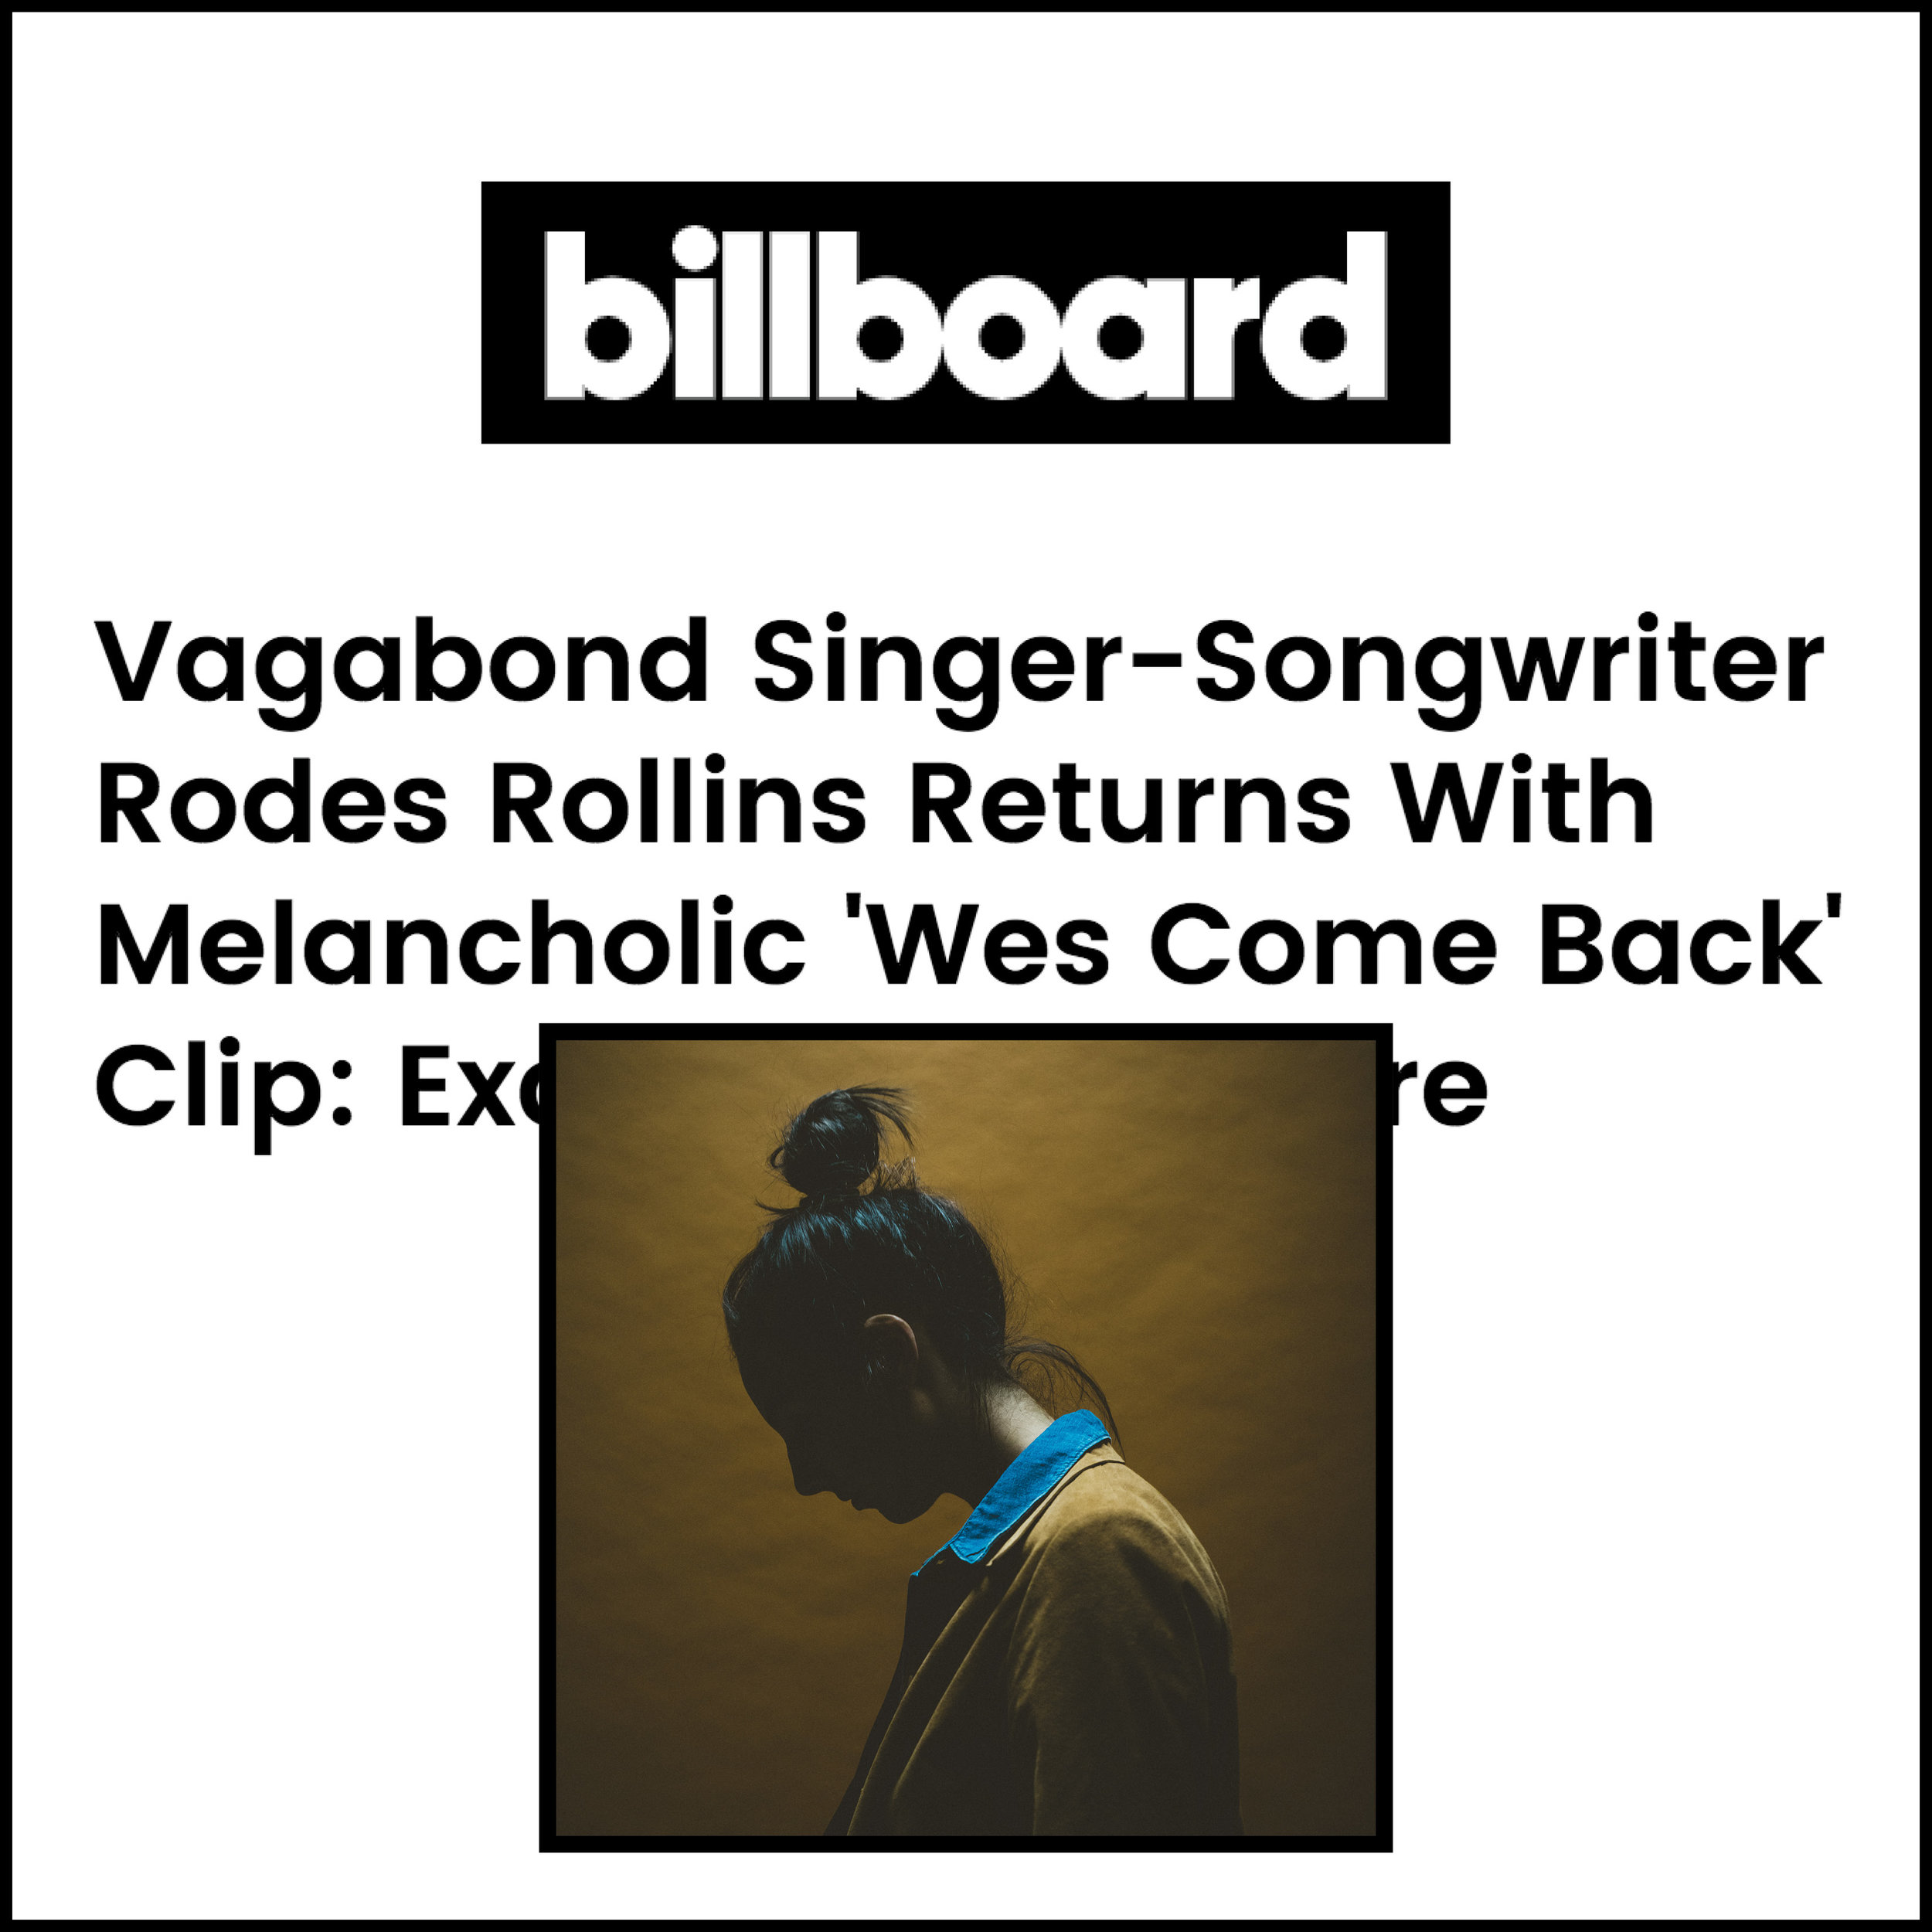 Link -  Billboard